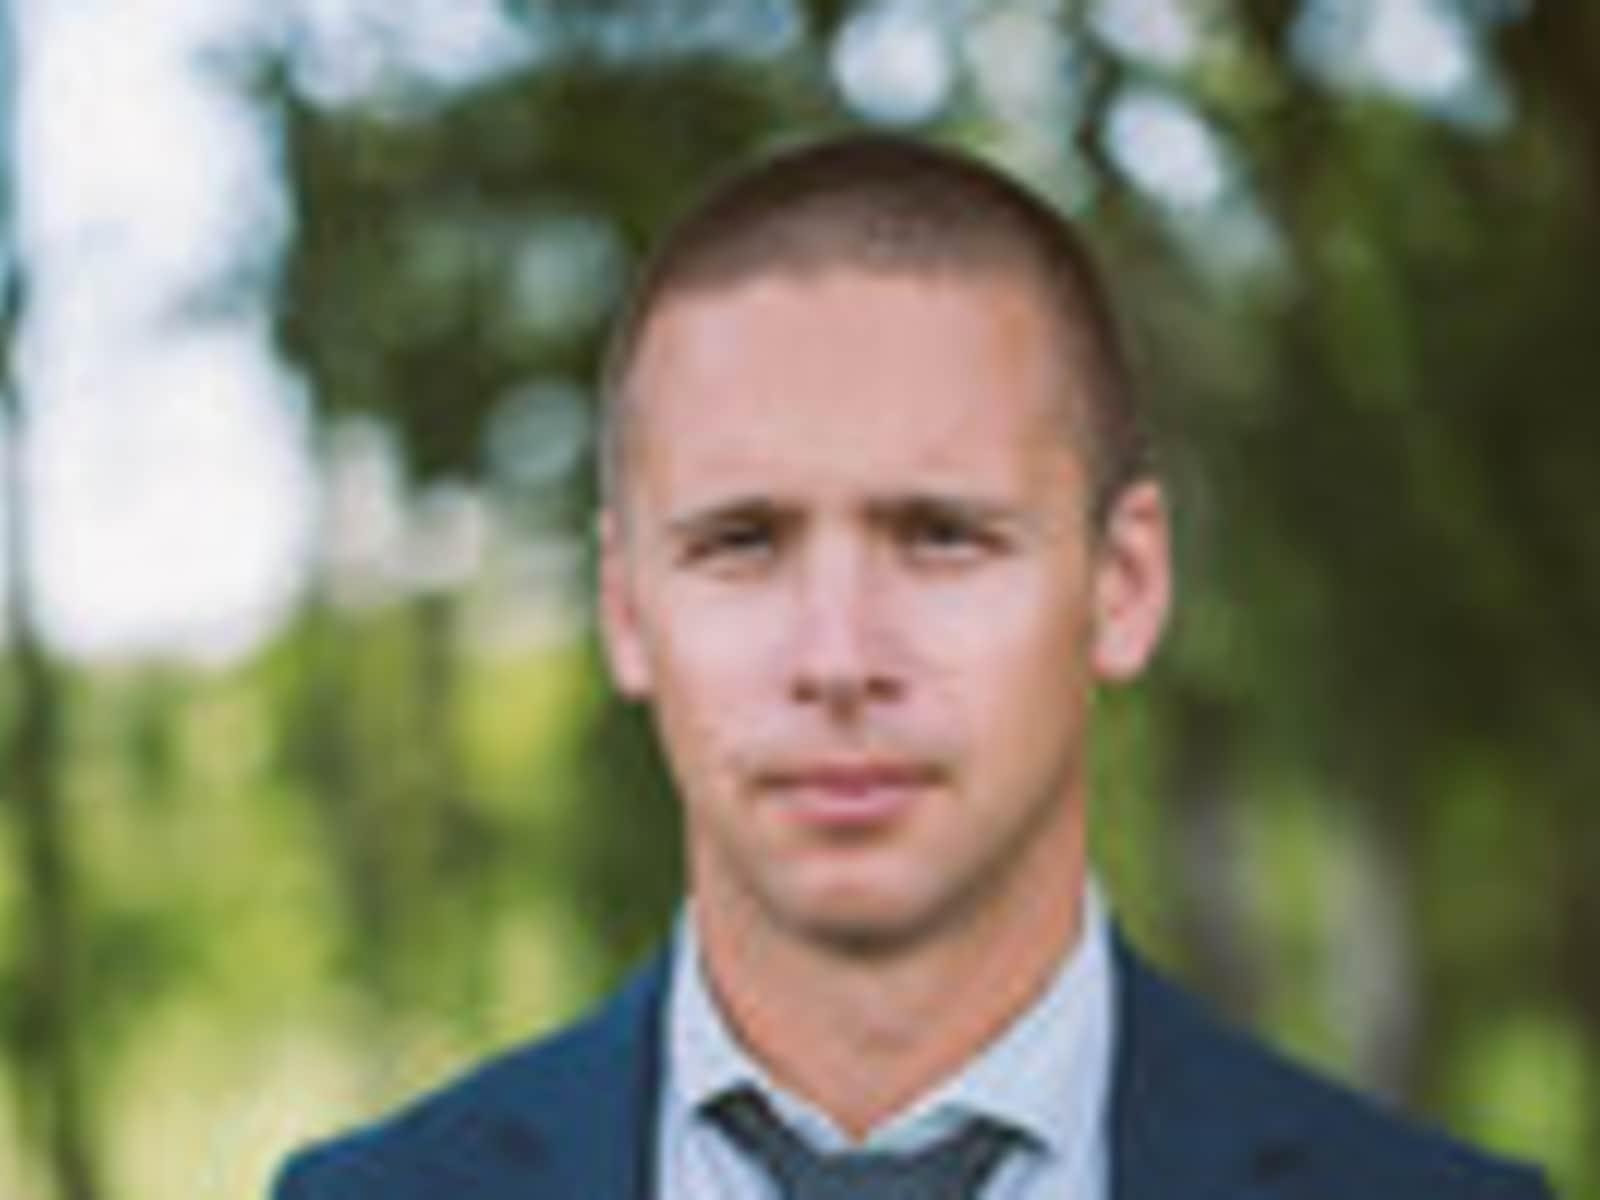 Scott from Calgary, Alberta, Canada